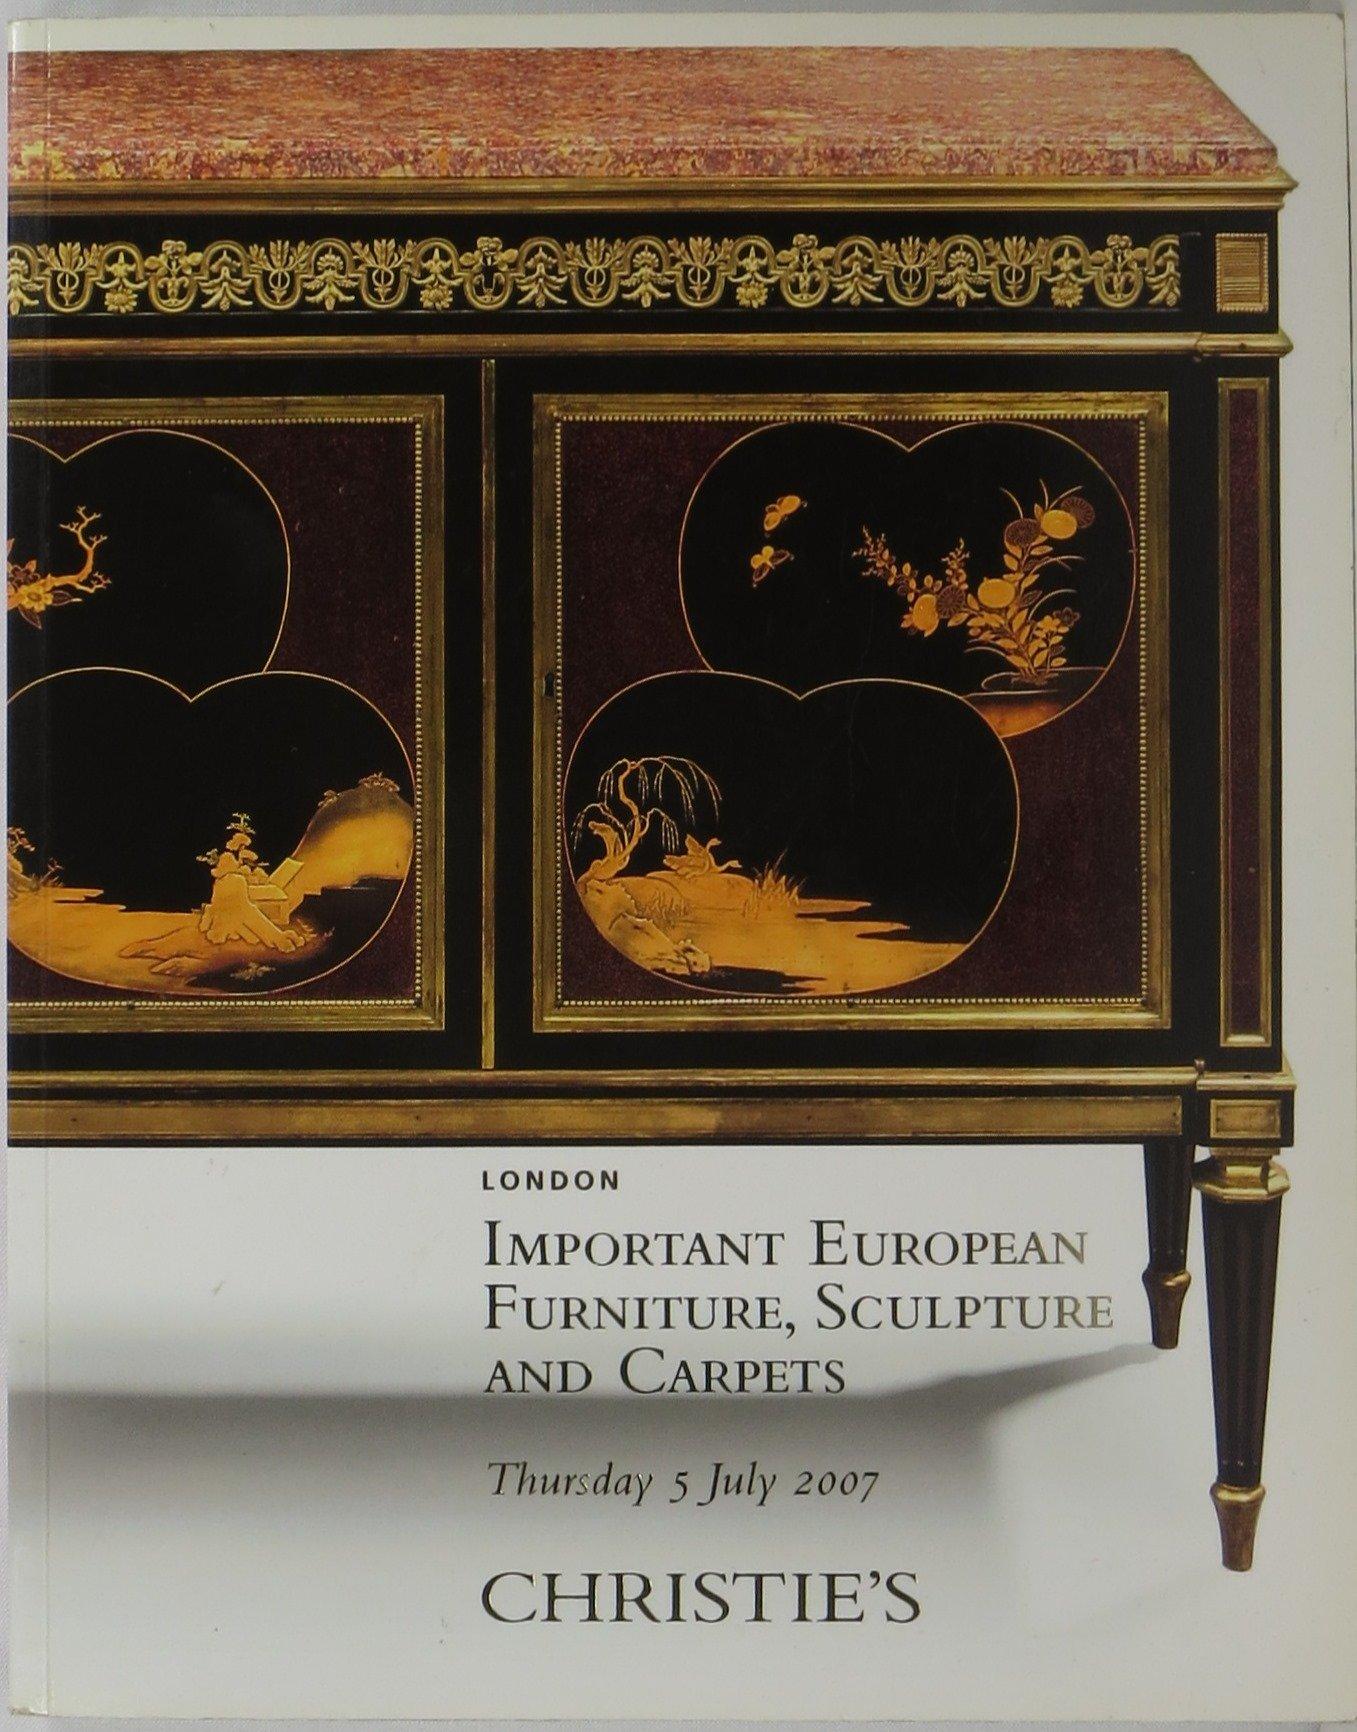 Download Christie's Important European Furniture, Sculpture and Carpets (Sale #7412) - London, July 5, 2007 pdf